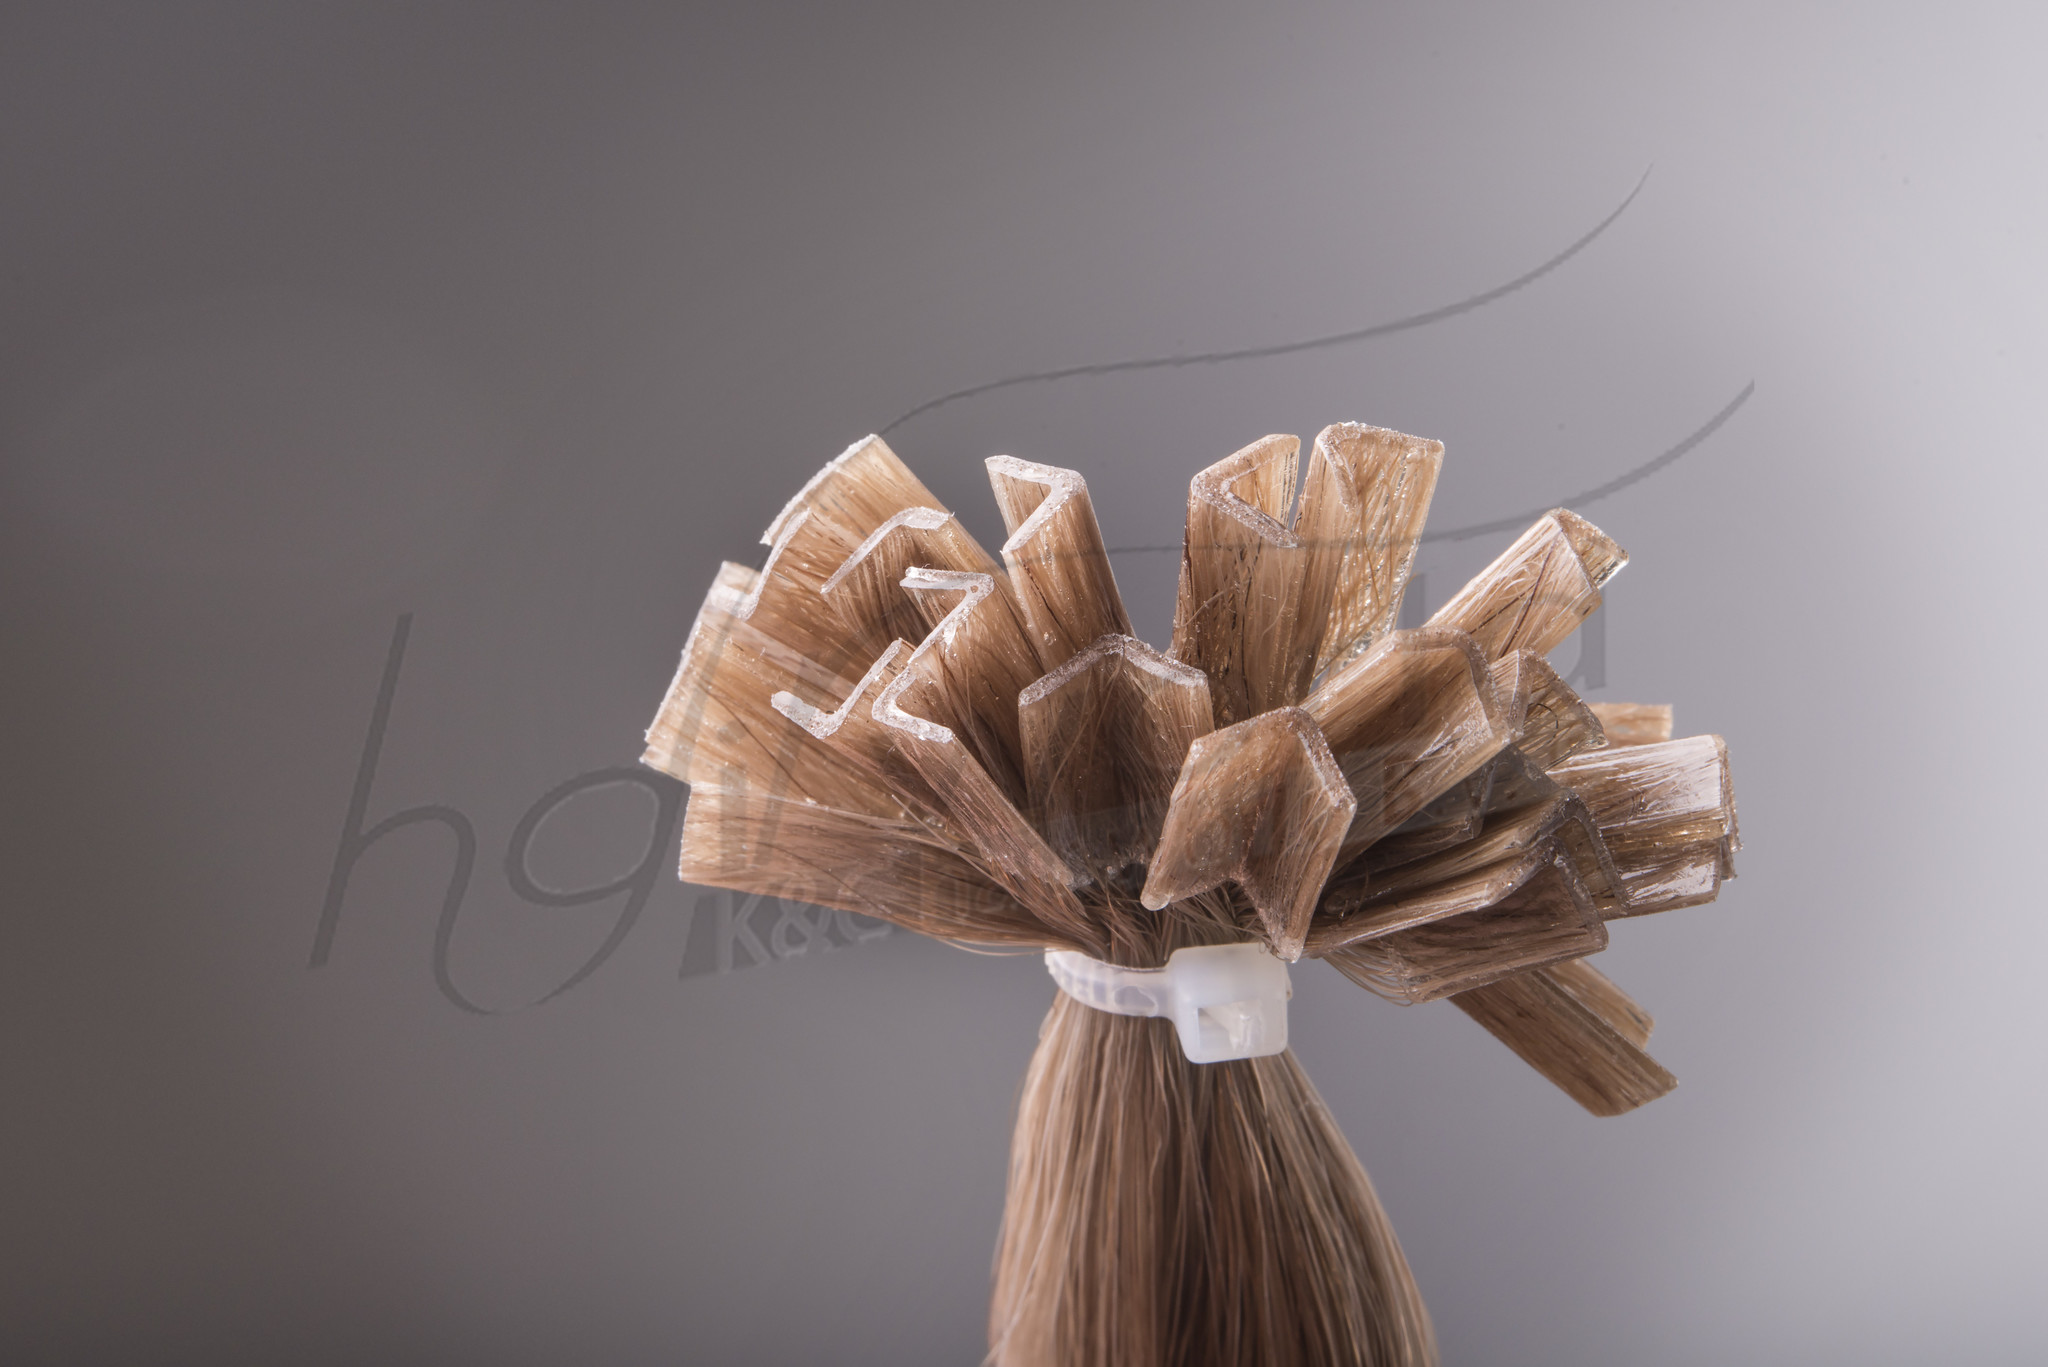 SilverFox Wax Extensions Steil  #14 Warm Ash Blonde